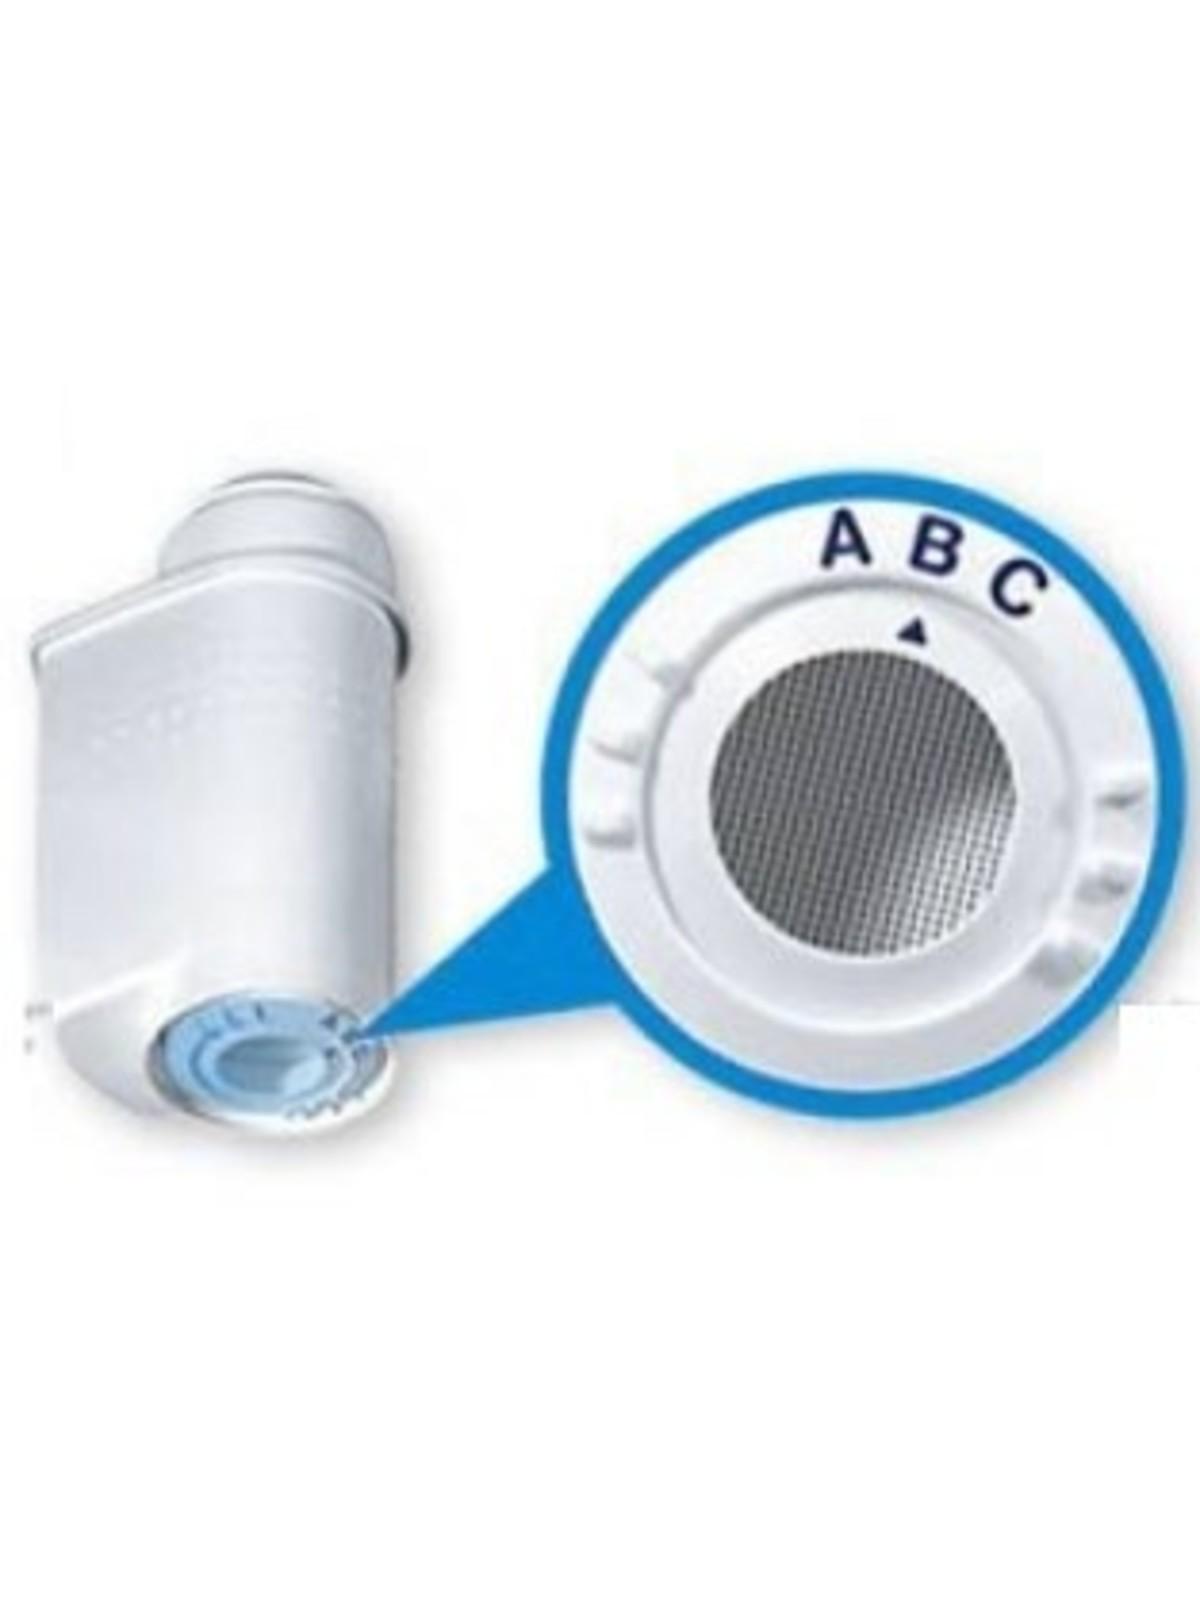 BOSCH Vero Series - Brita Intenza Waterfilter TCZ7003